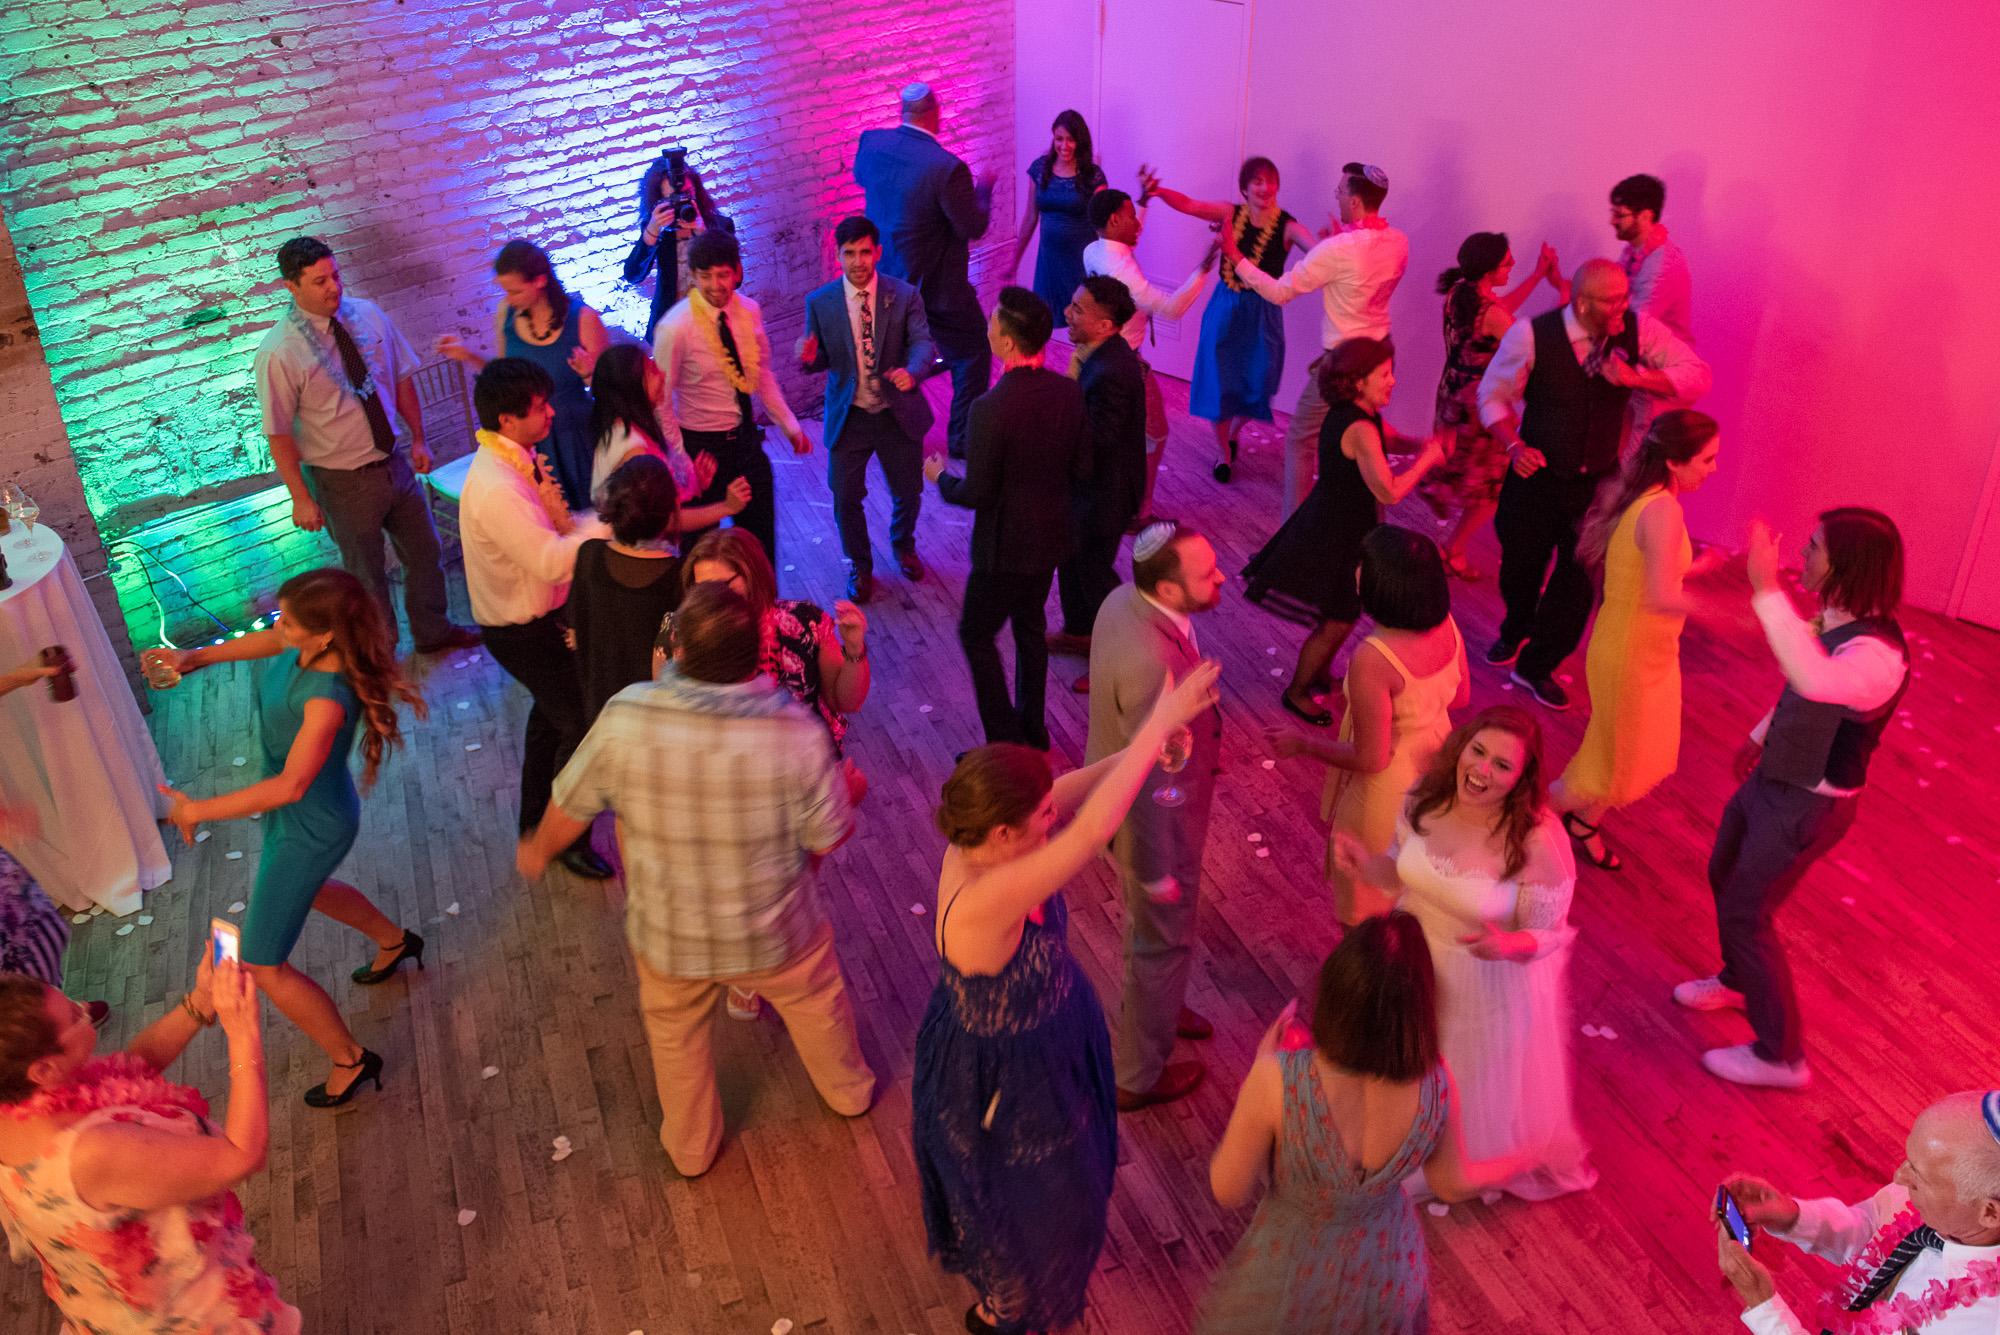 180617_events_wedding_rachel_chuck_104.jpg